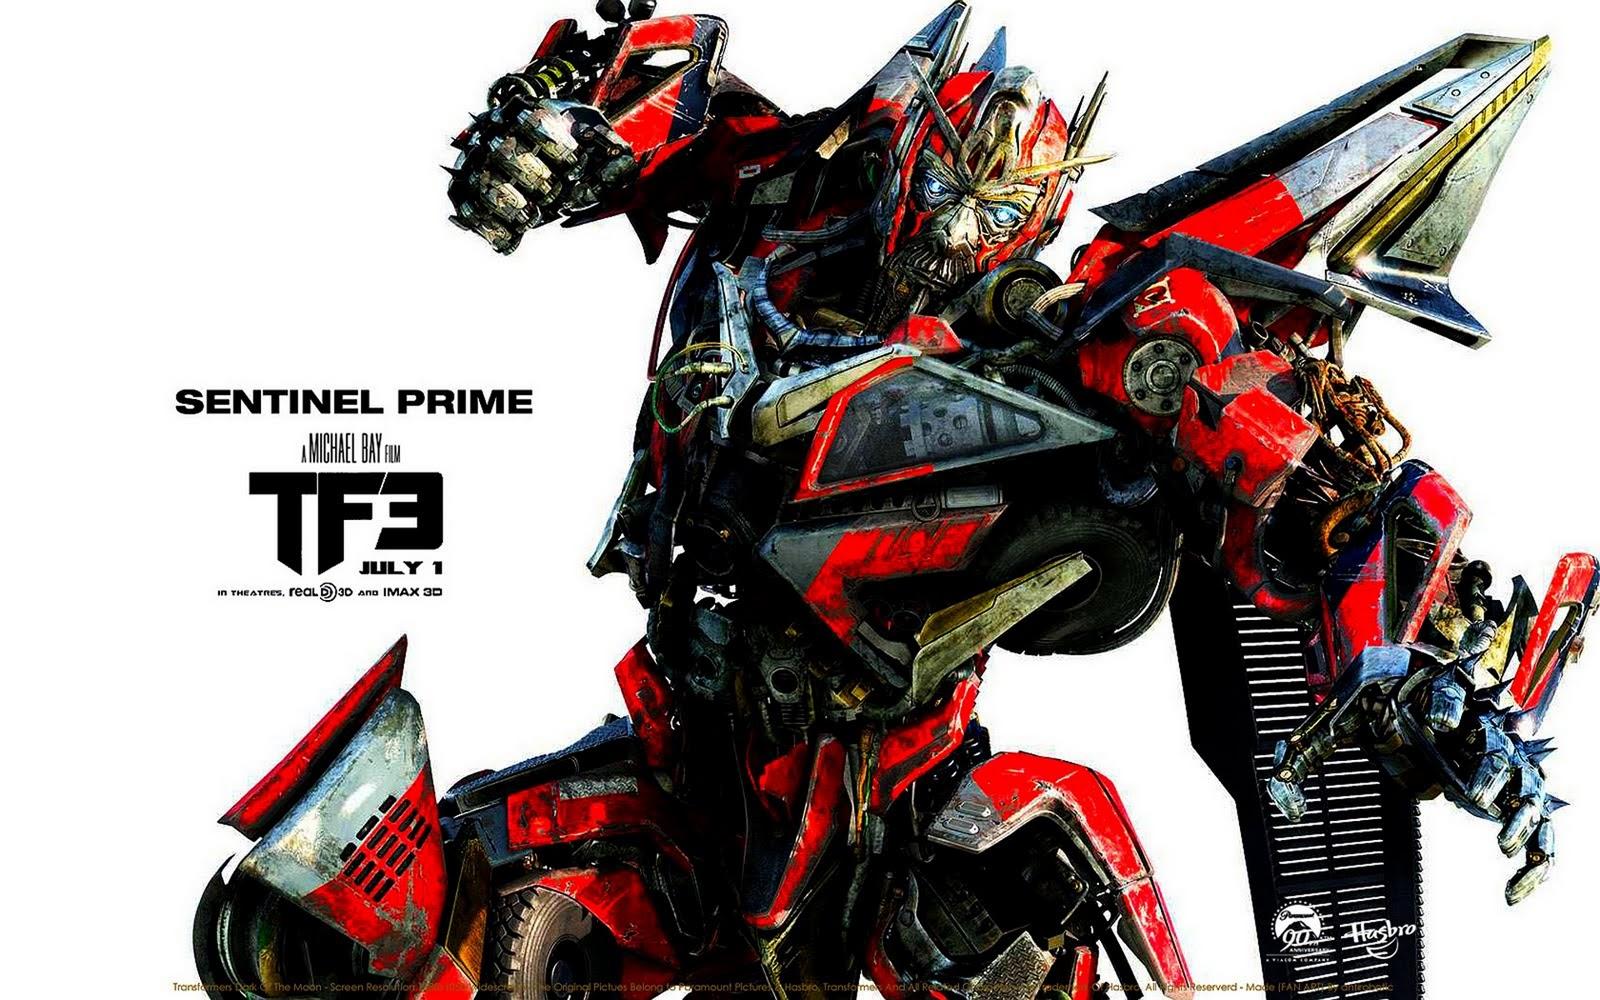 And 2 Transformers Mikaela Sam